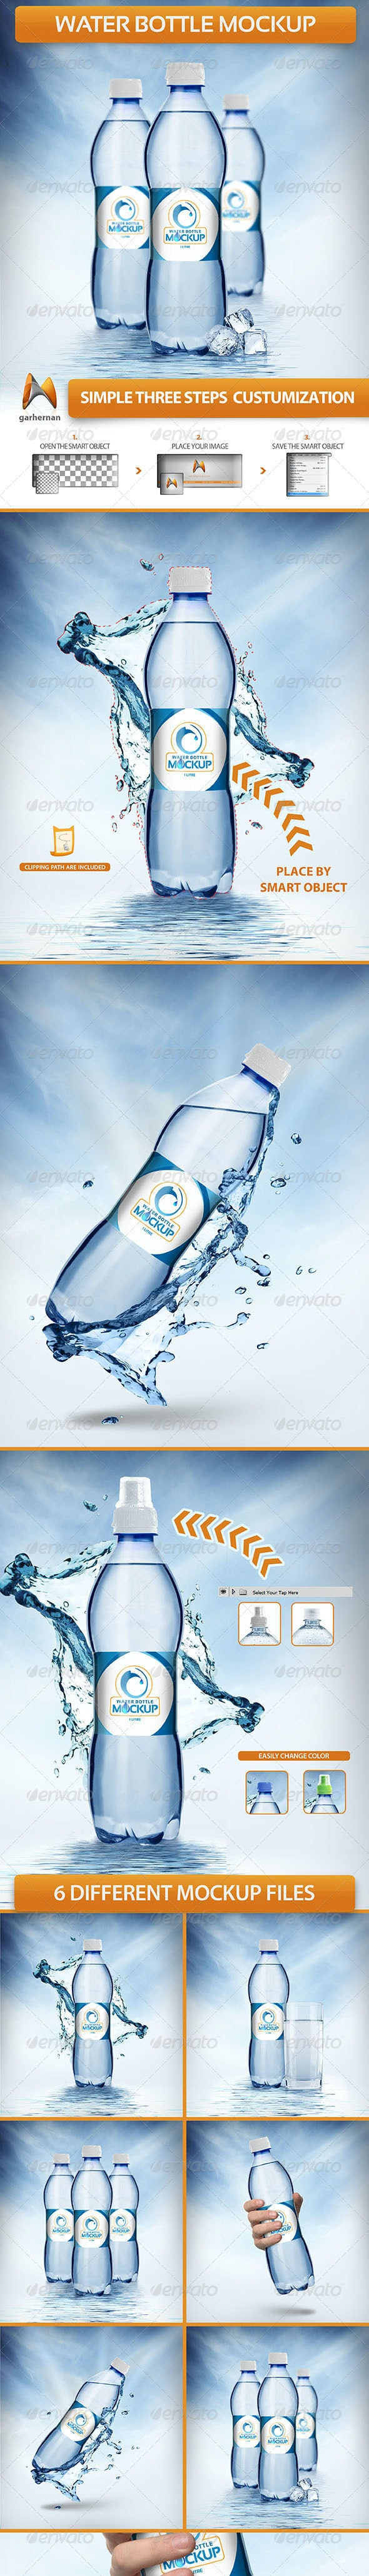 Water Bottle Mockup - Food and Drink Packaging